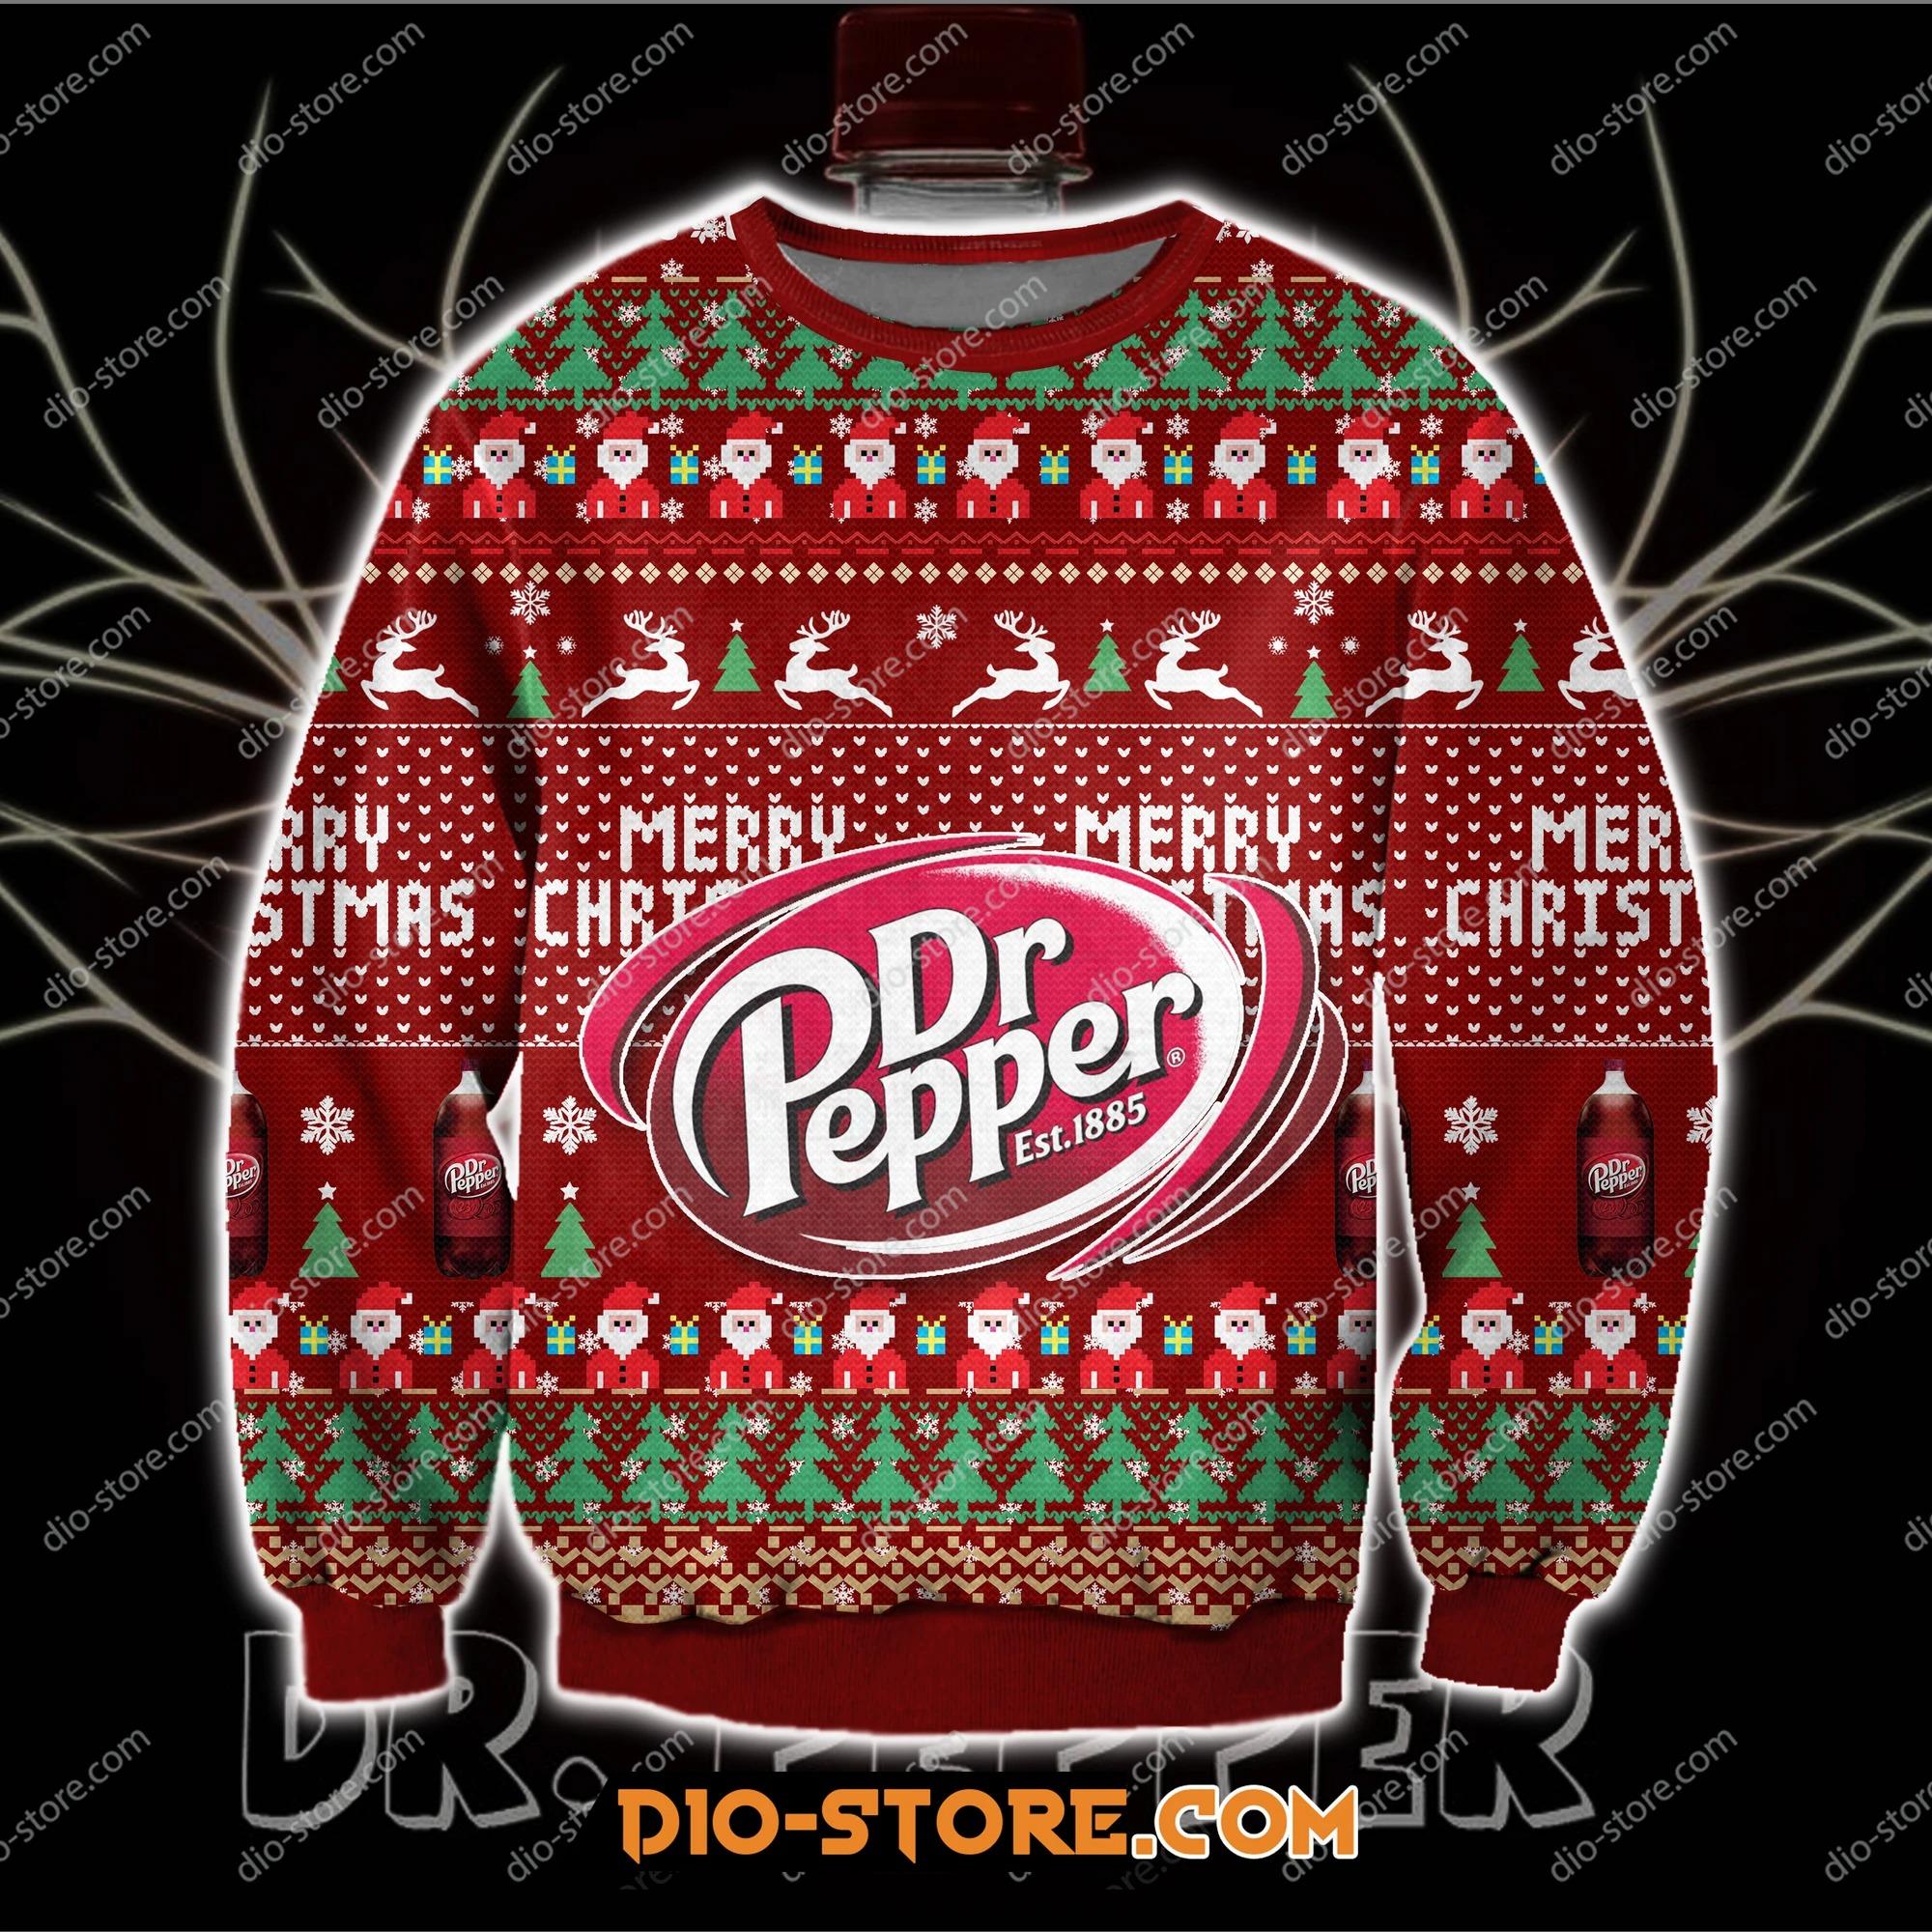 DprintknittingpatternDRpepperprintuglychristmassweater